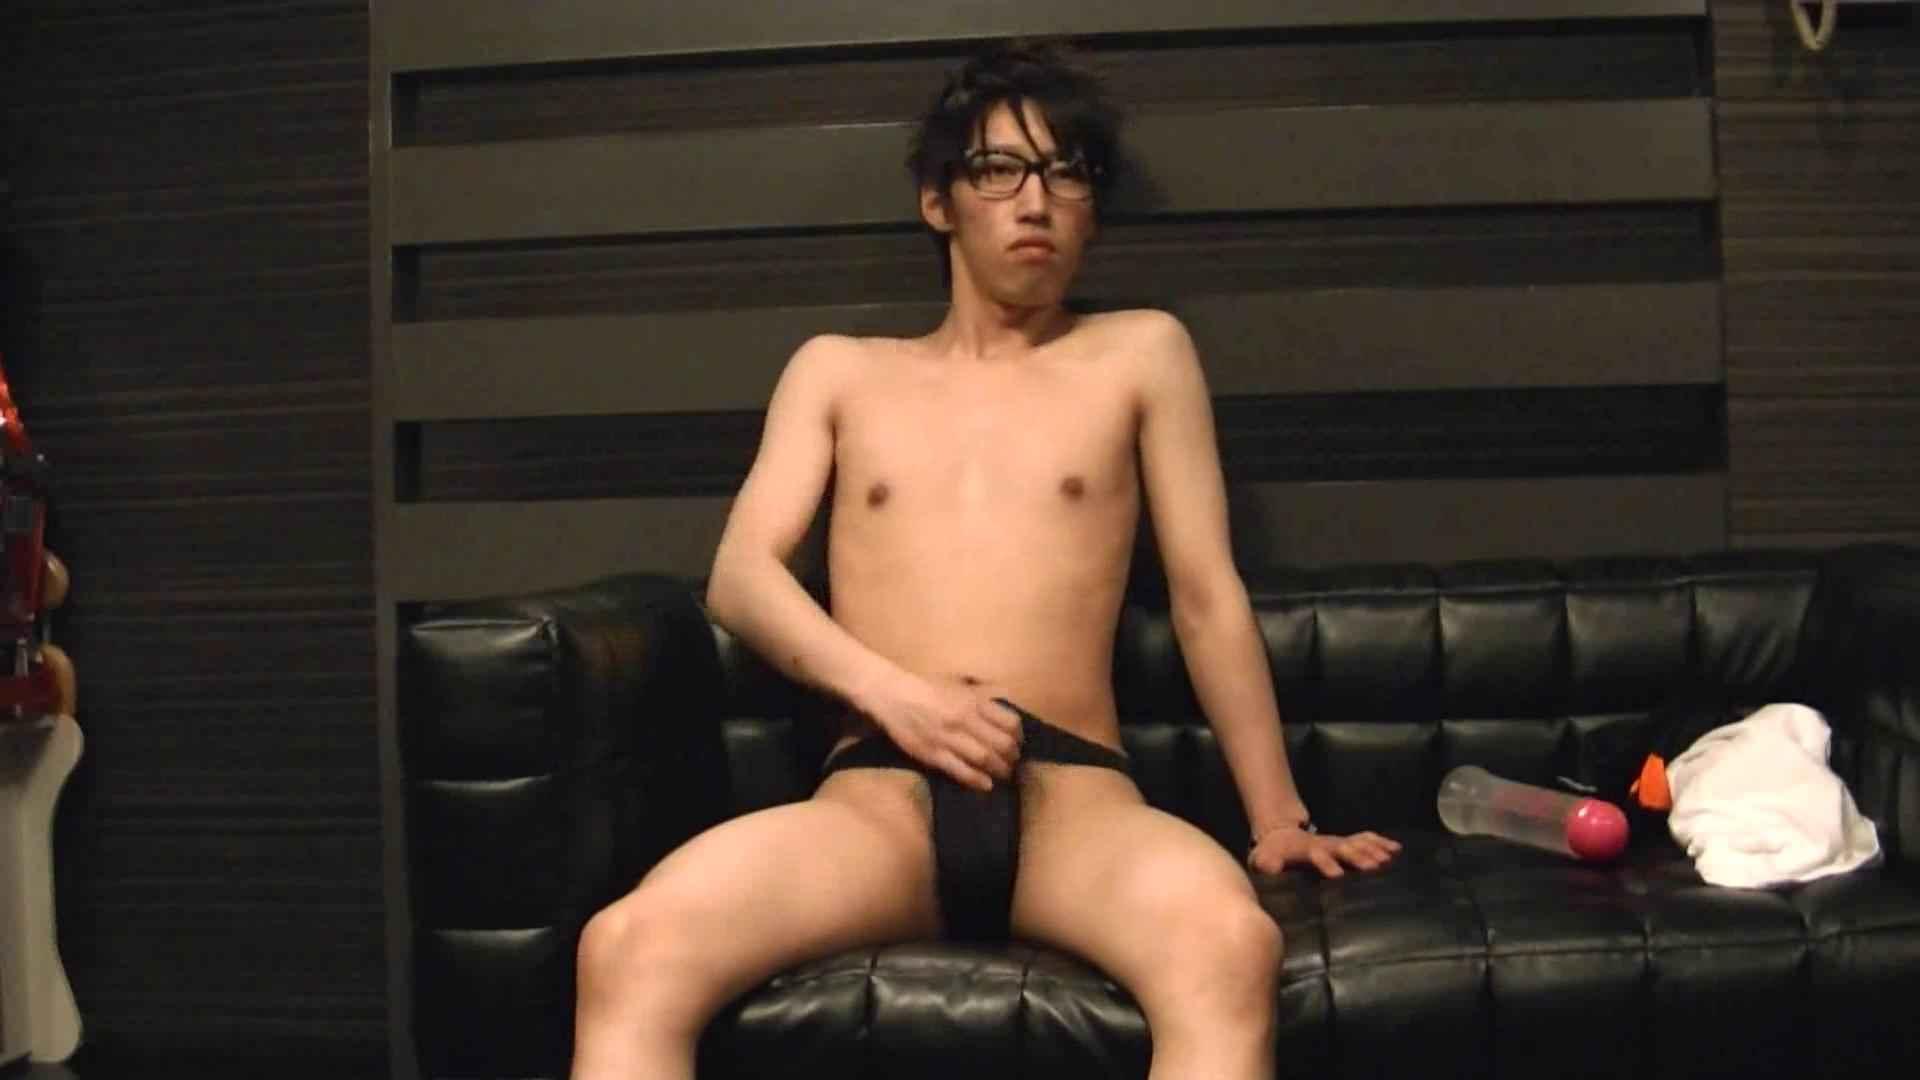 ONA見せカーニバル!! Vol3 男  93pic 29